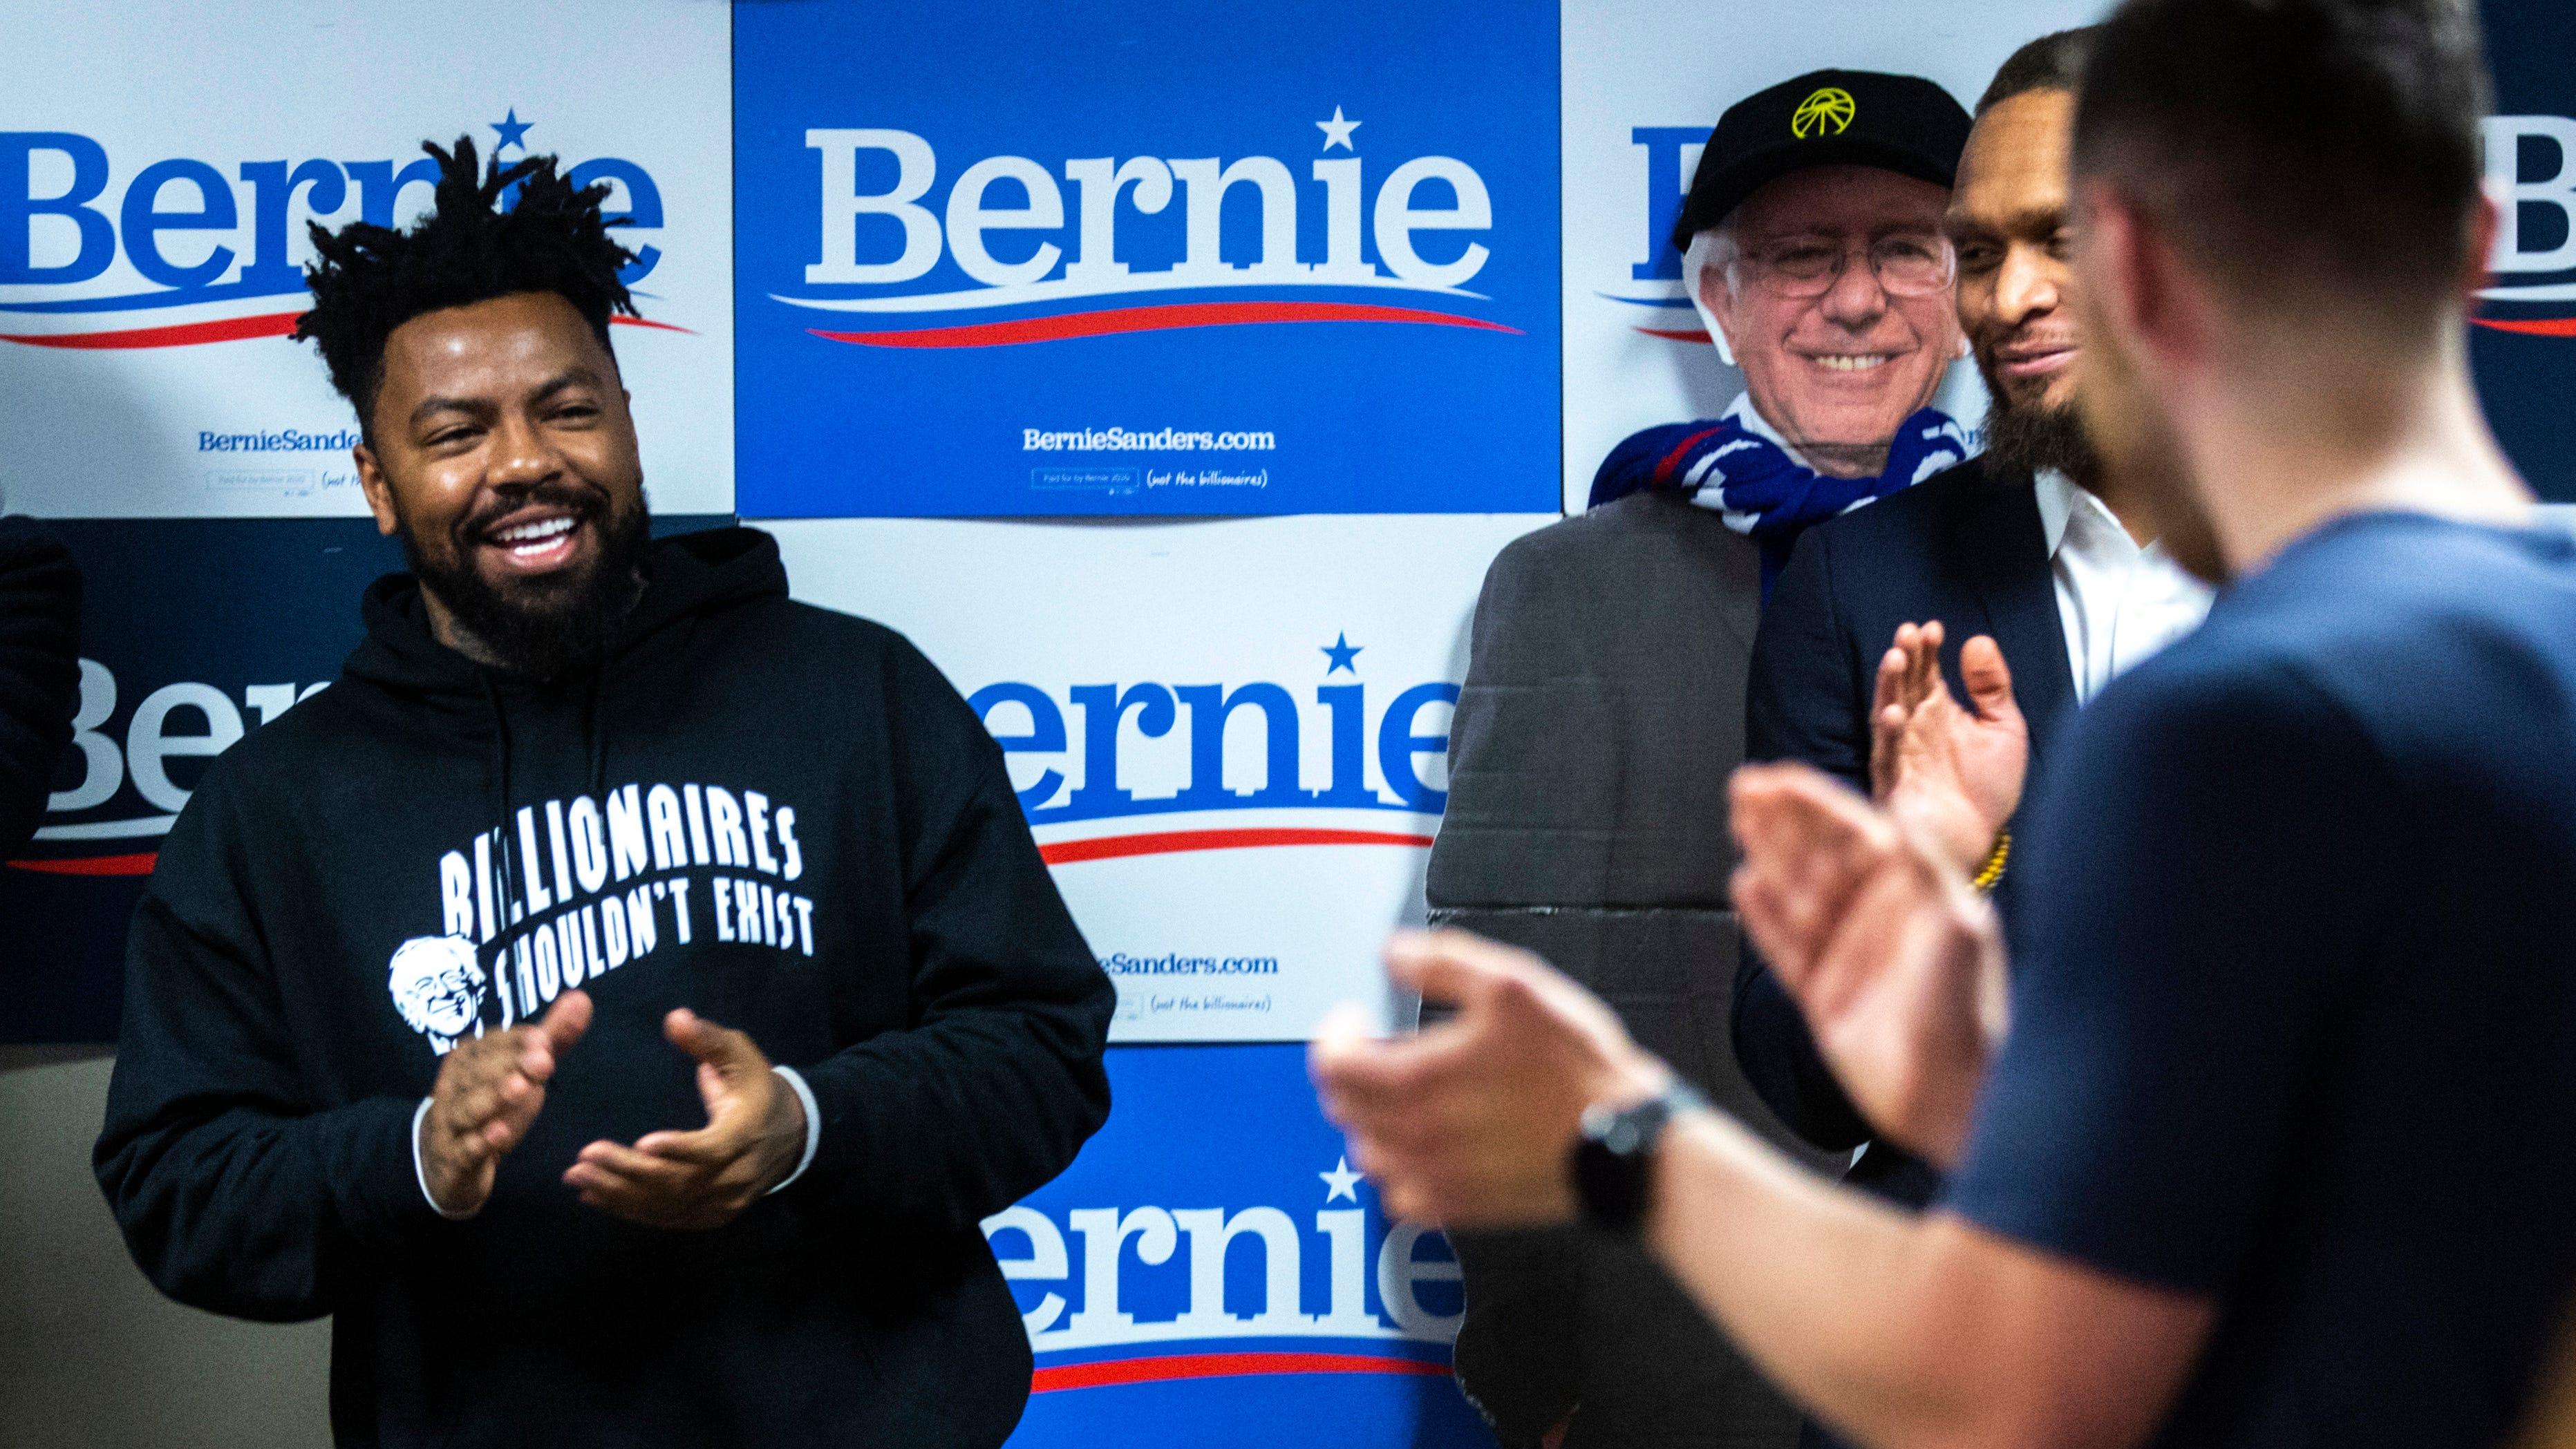 Photos: Phillip Agnew and Mike Posner speak to Bernie Sanders volunteers in Iowa City